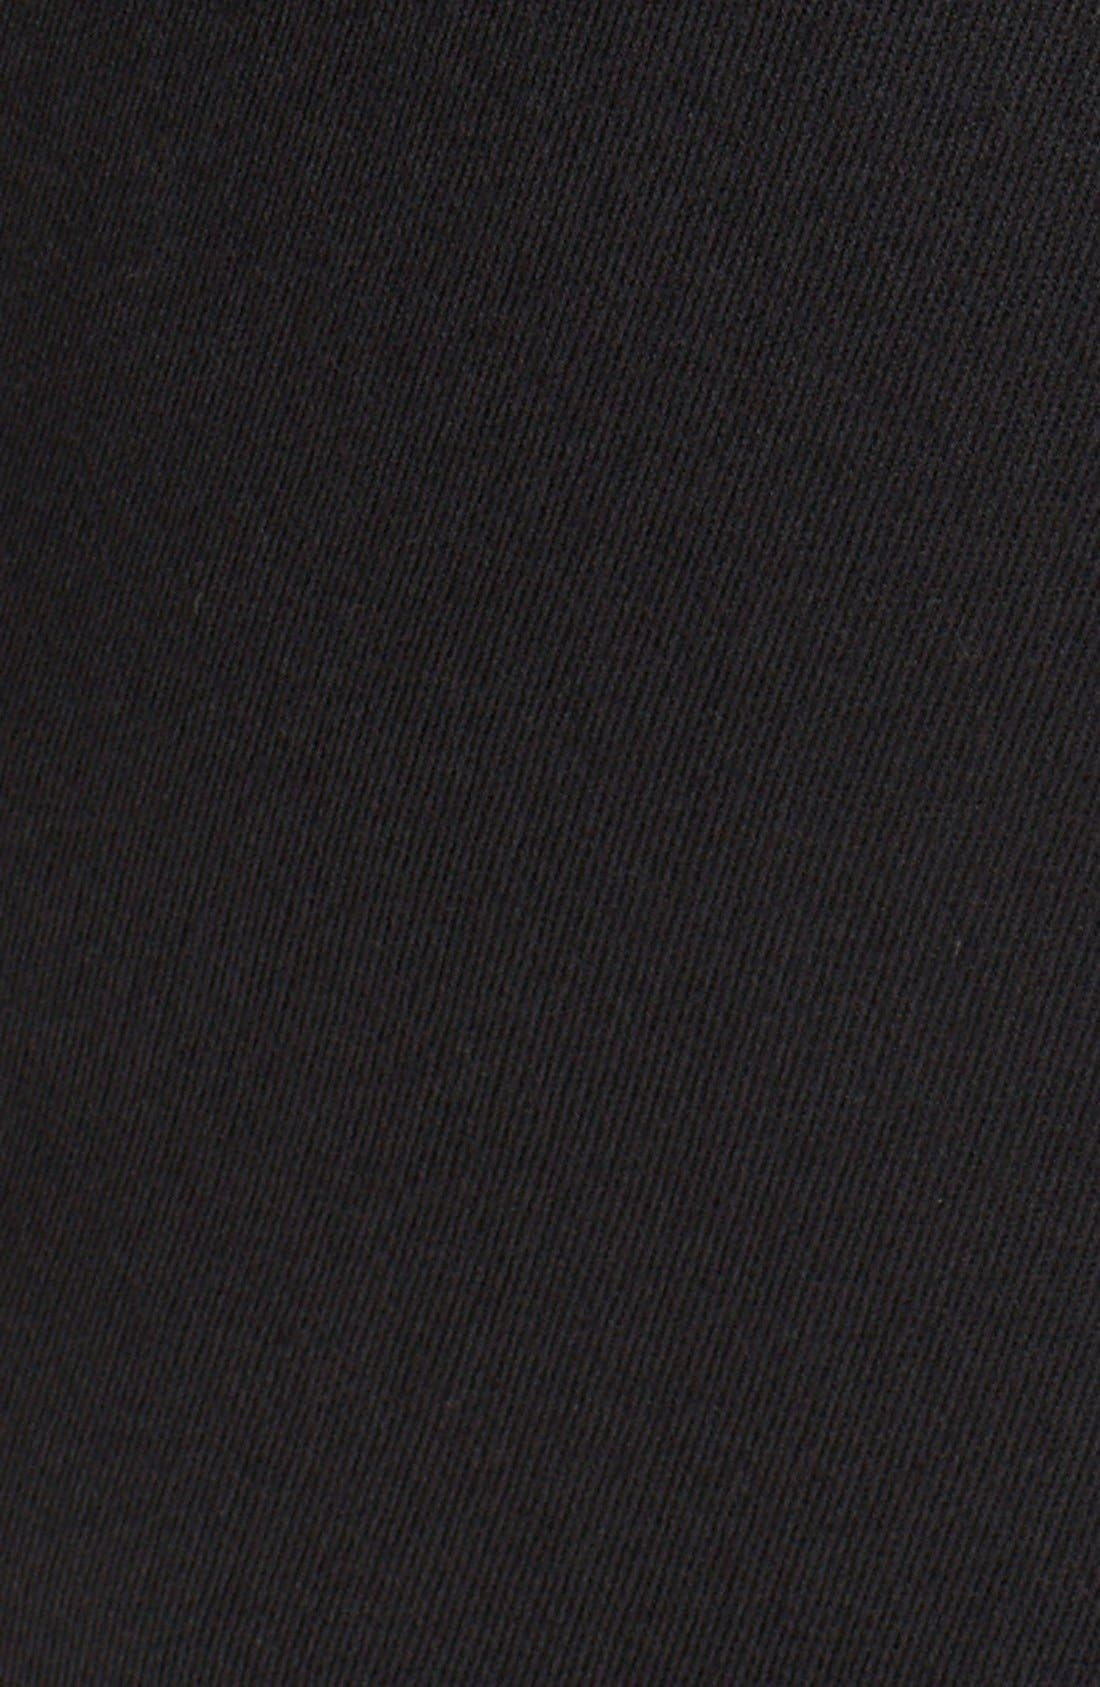 Alternate Image 3  - Vetements 'Sado' Wool Minidress